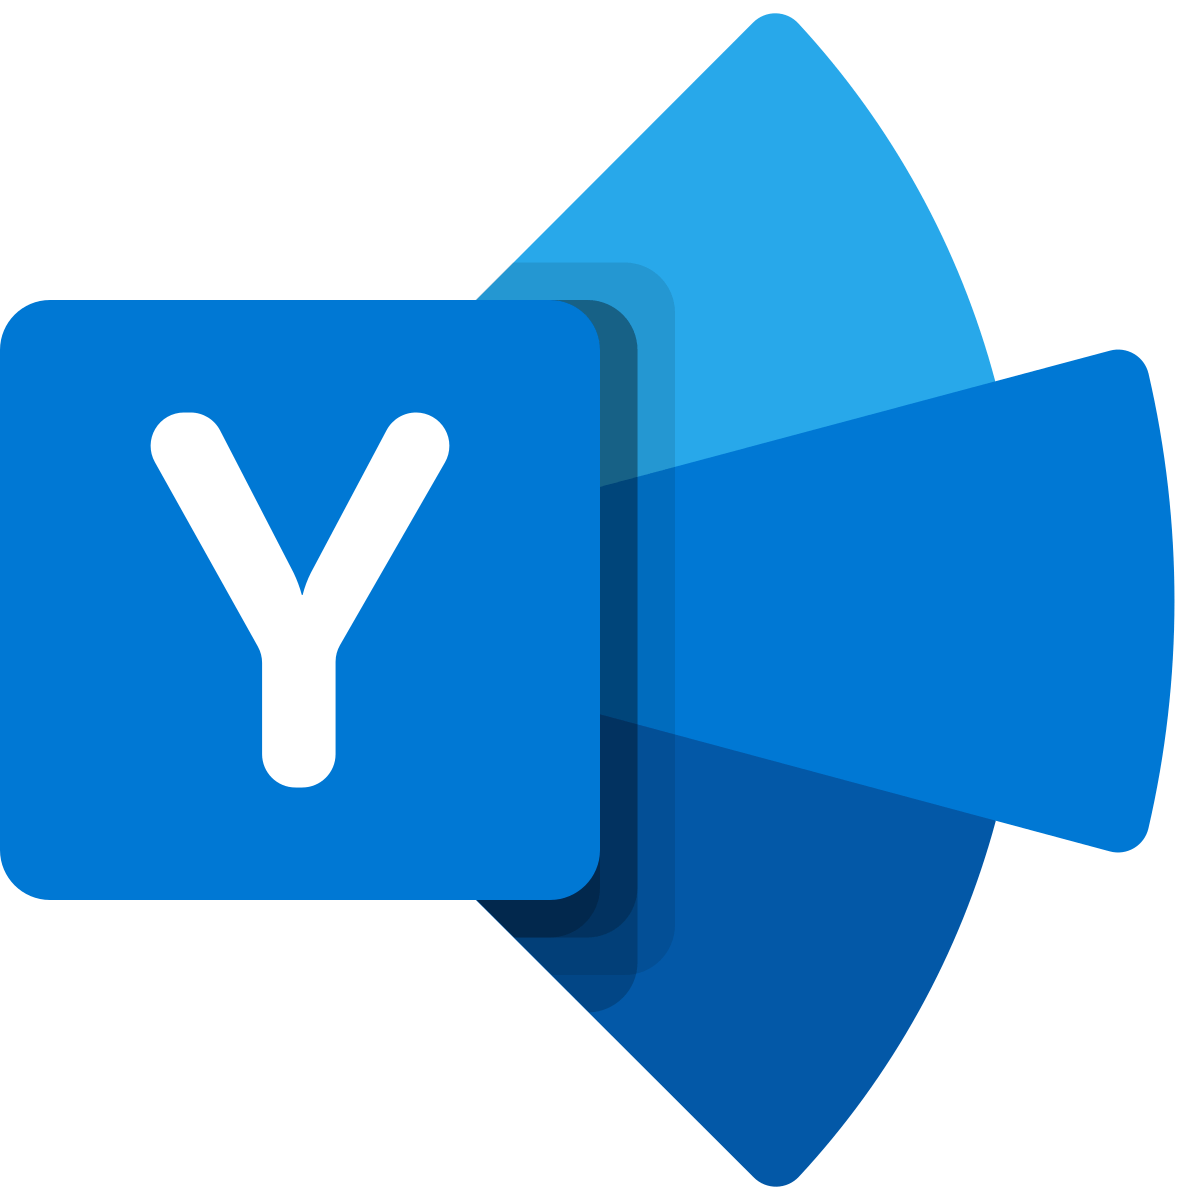 PowerPoint Yammer integration